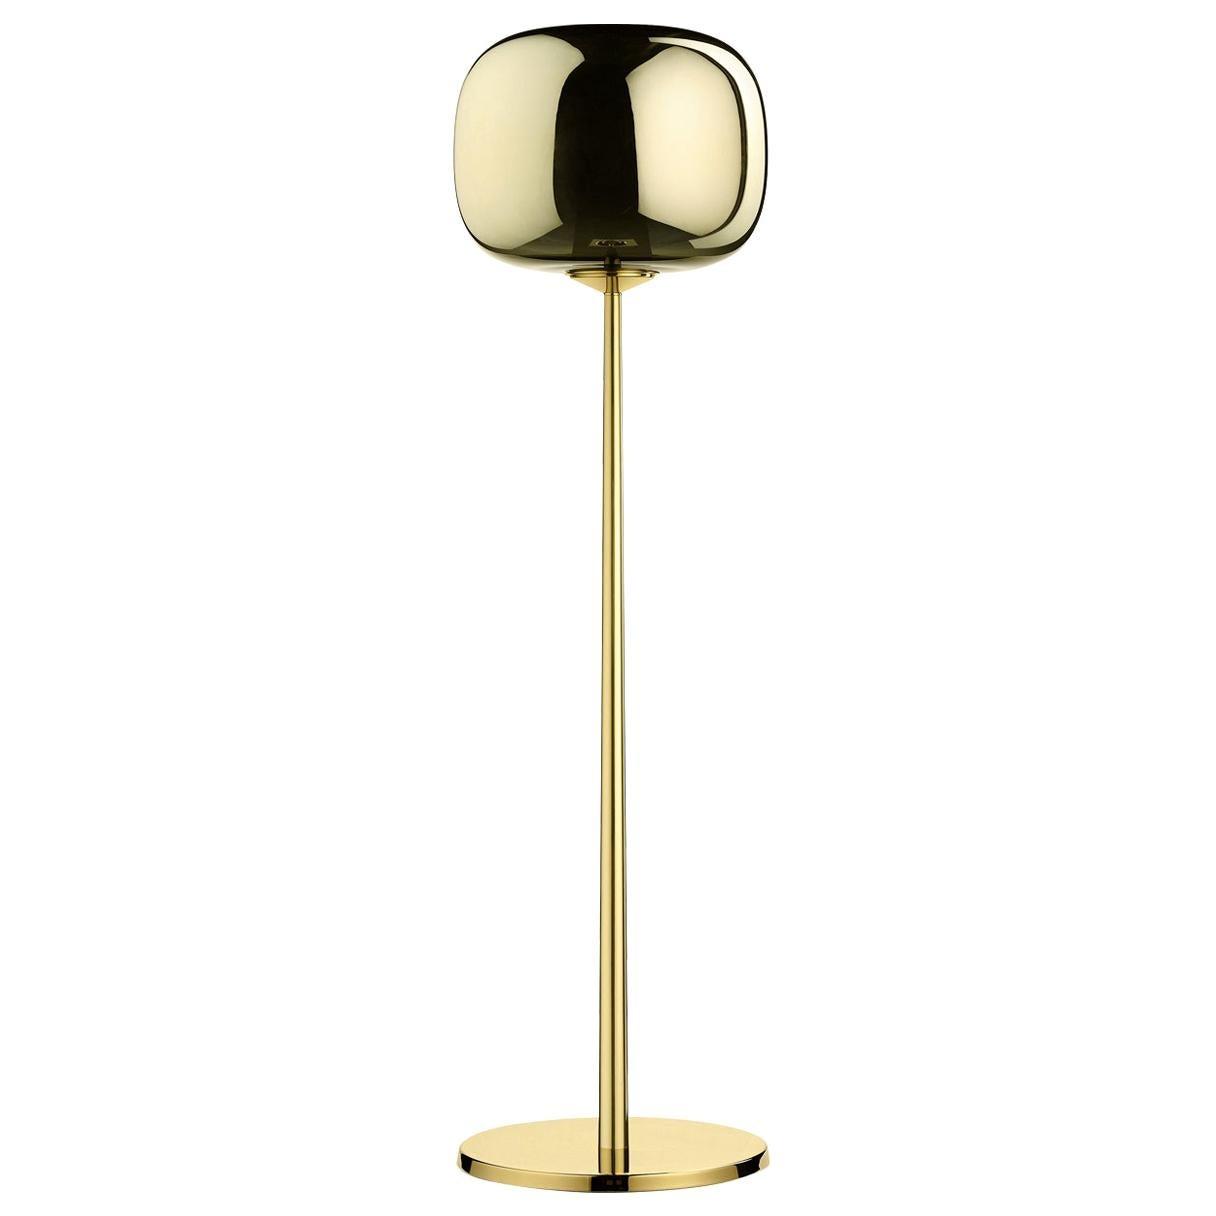 Dusk Dawn Brass Floor Lamp By Branch